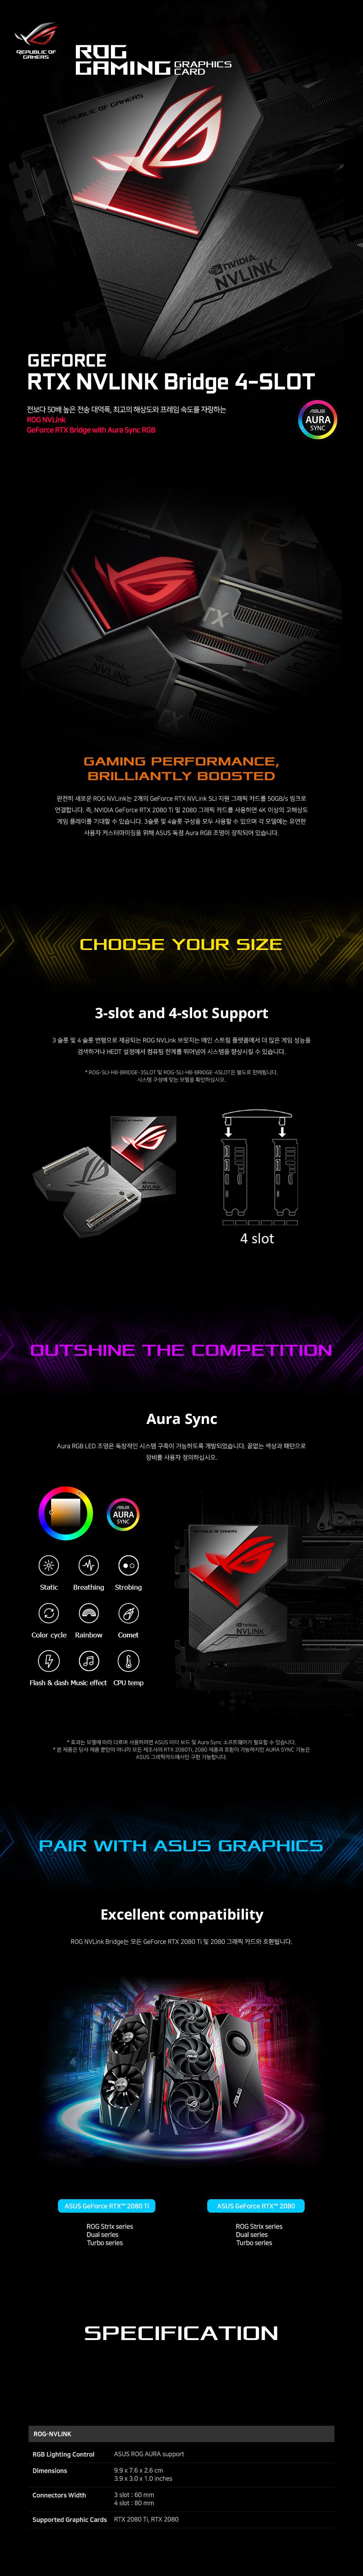 ASUS ROG STRIX NV링크 브릿지 4-Slot